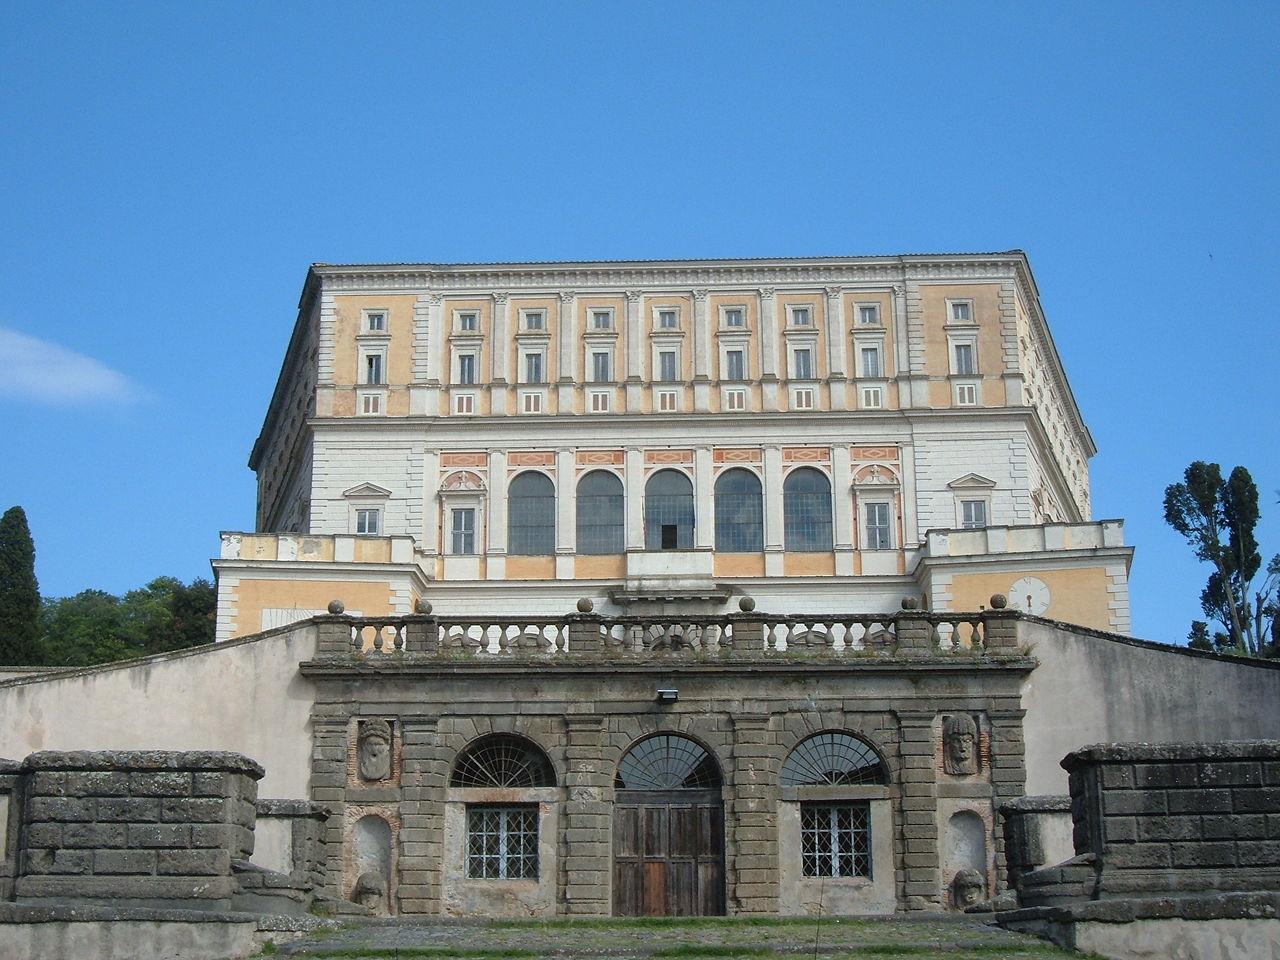 palazzo farnese - photo #15